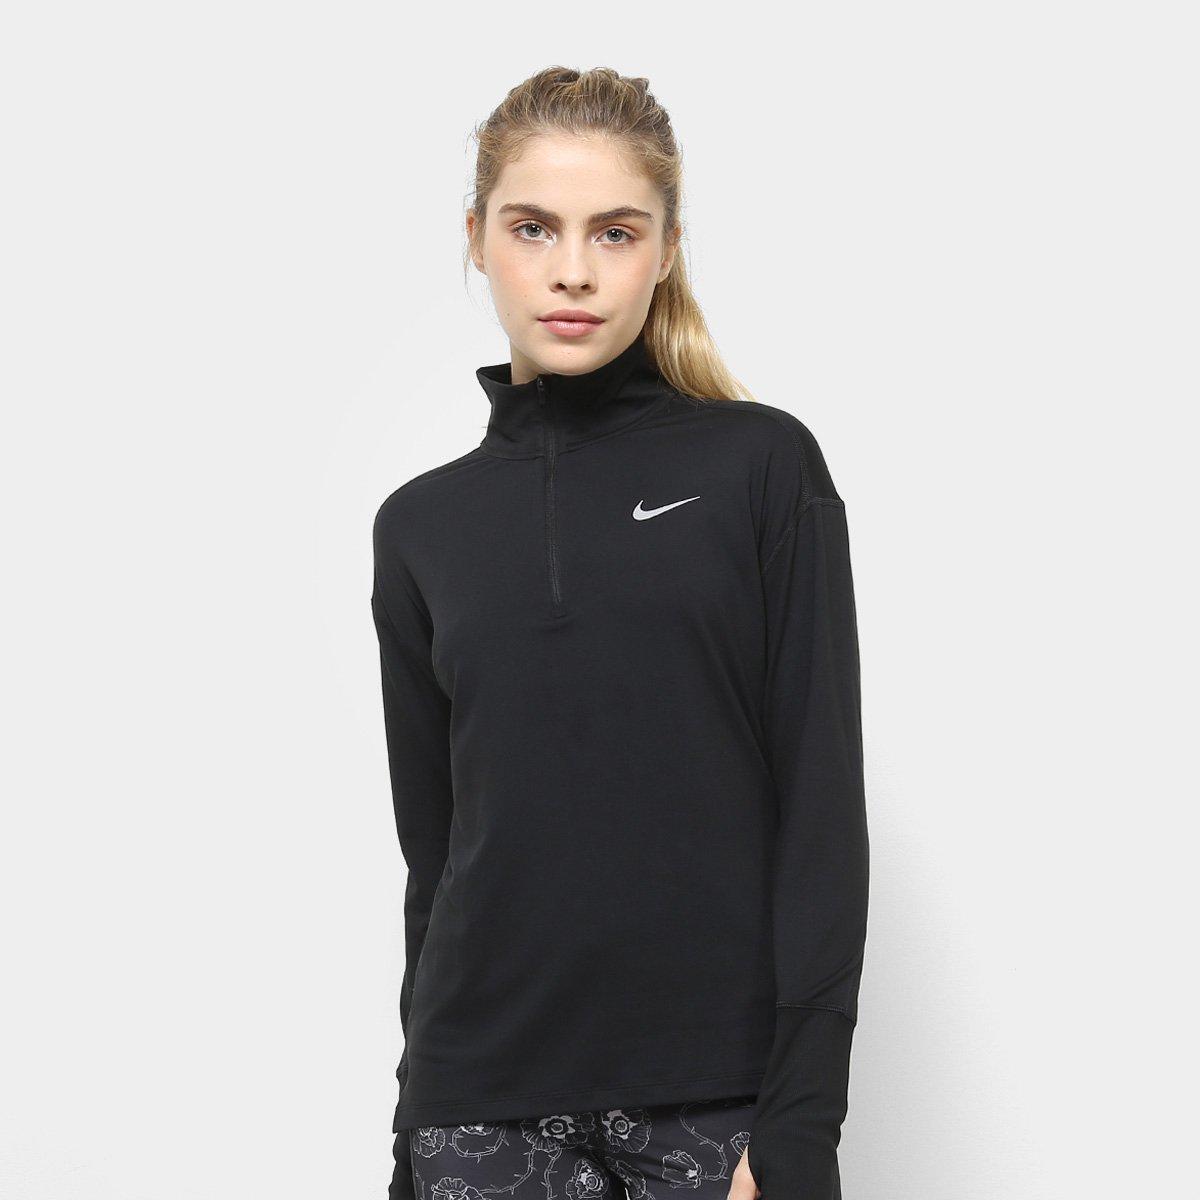 Jaqueta Nike Element Top Hz Feminina Preto